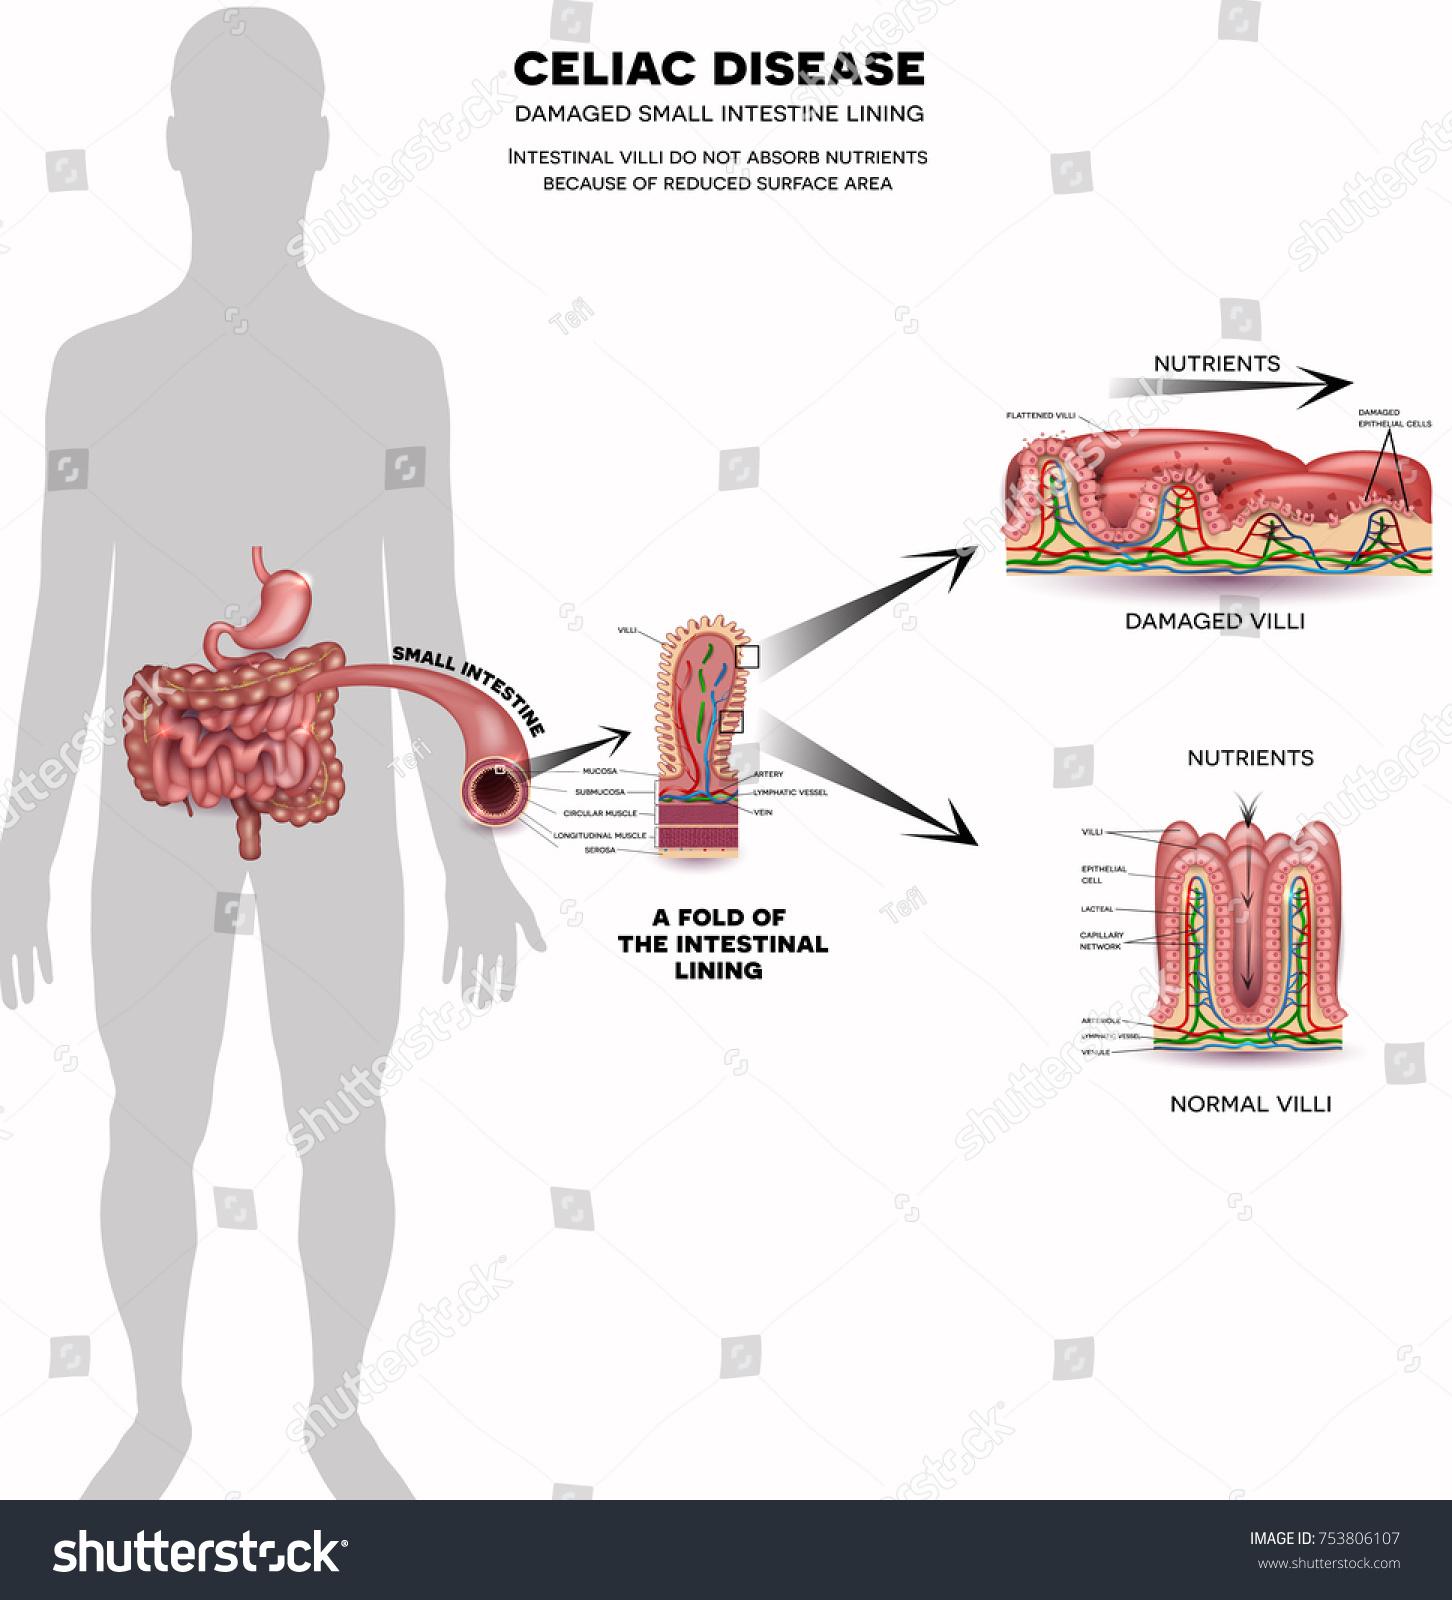 Celiac Disease Affected Small Intestine Villi Stock Vector Royalty